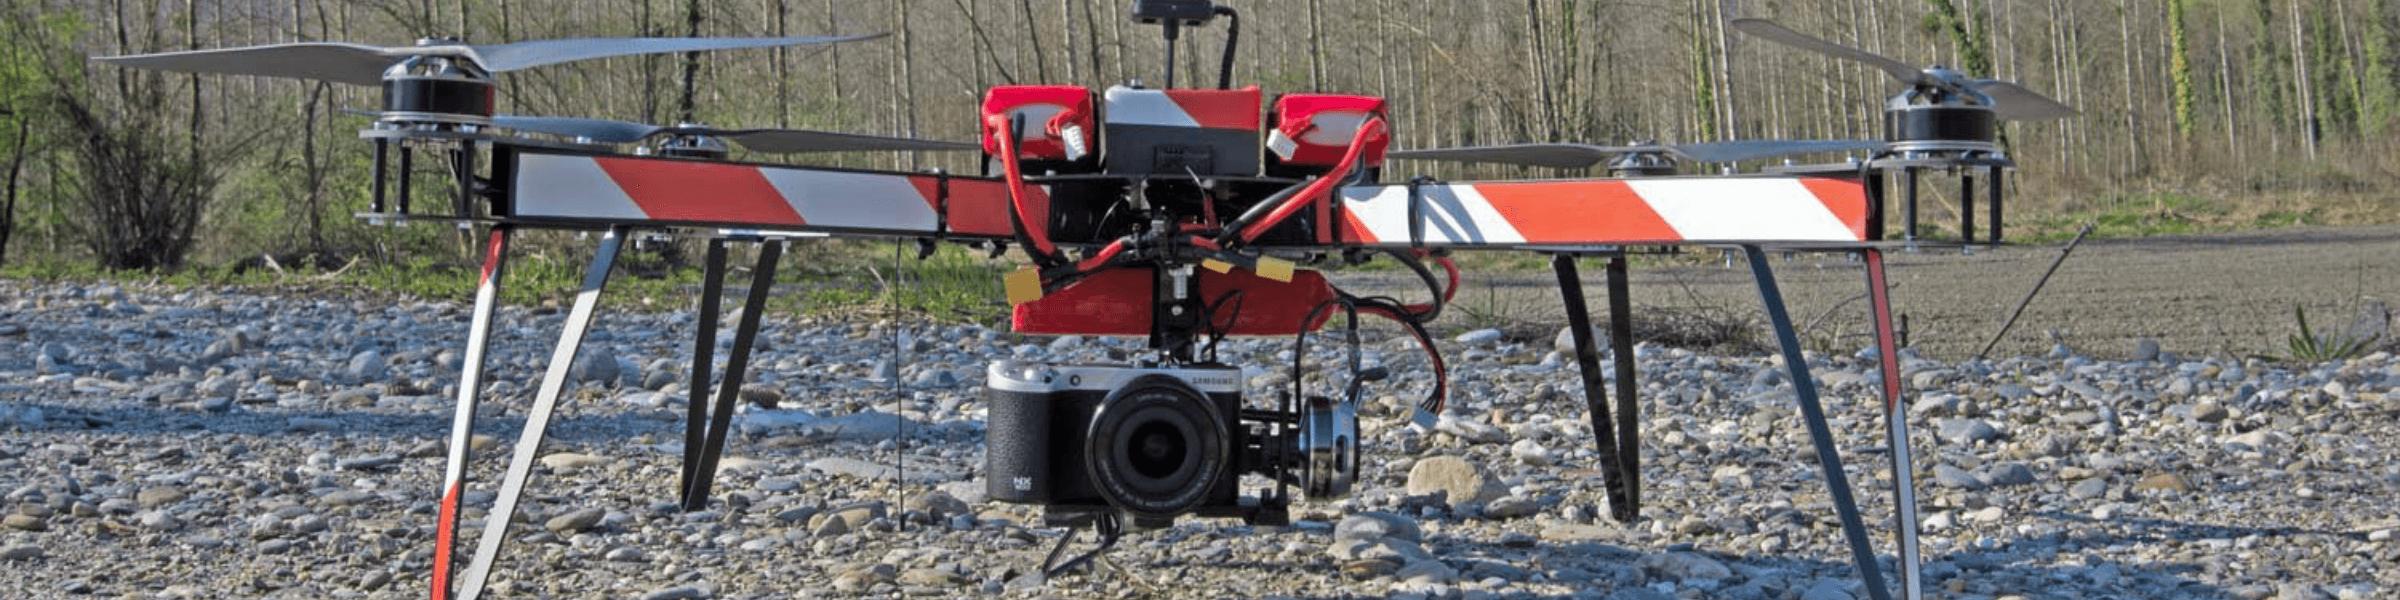 avis drone hubsan x4 h107c